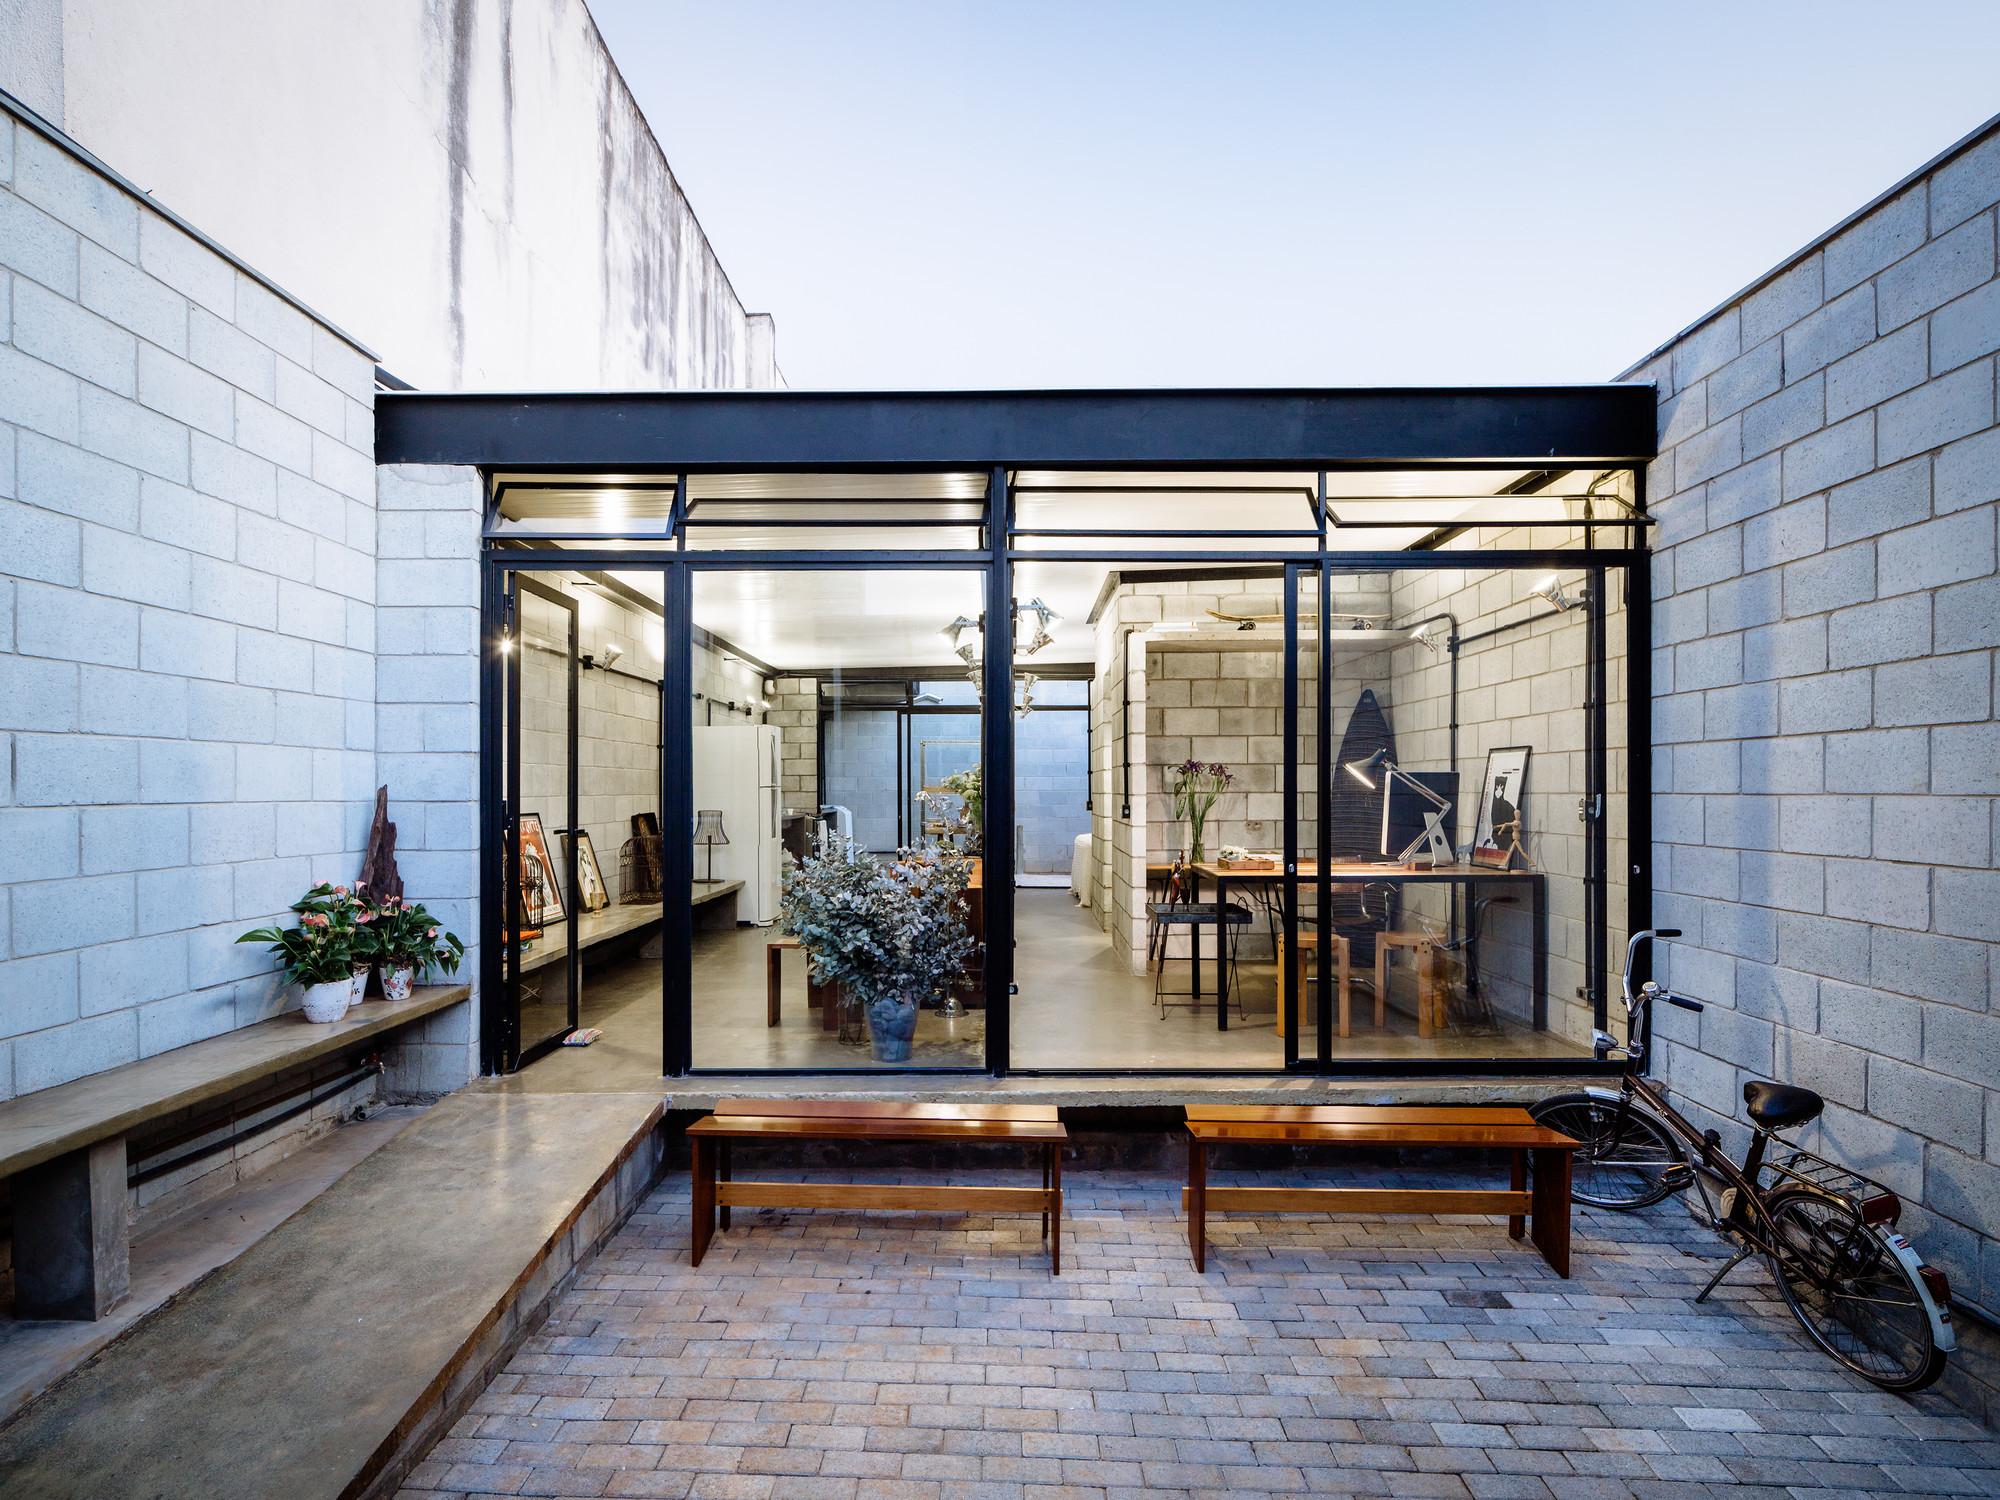 Casa + Estudio / Terra e Tuma Arquitetos Associados, © Pedro Kok